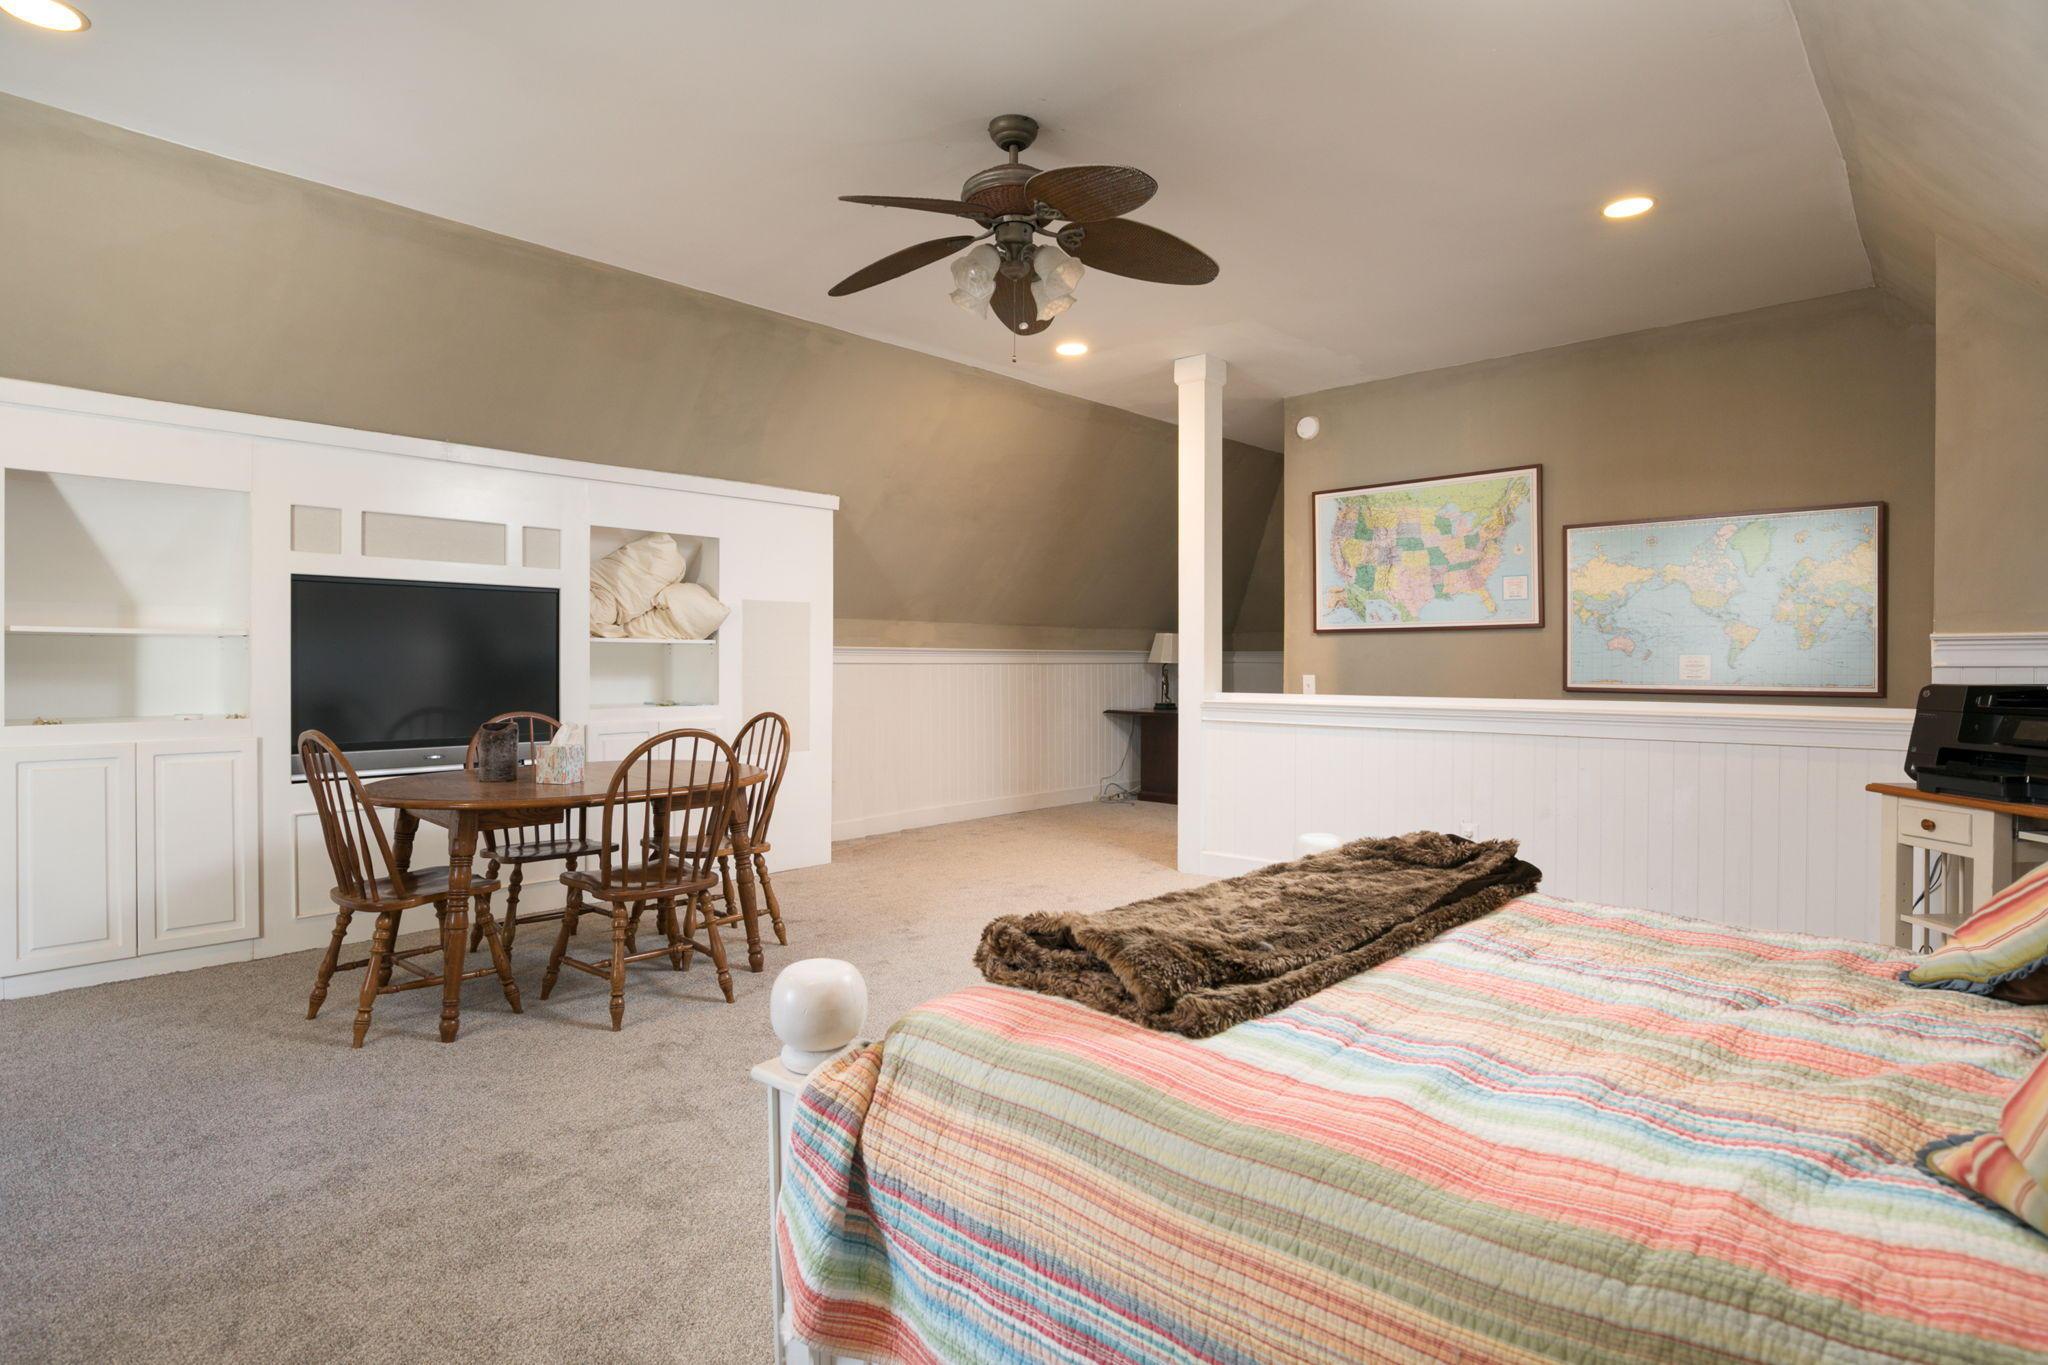 Dunes West Homes For Sale - 3625 Colonel Vanderhorst, Mount Pleasant, SC - 14